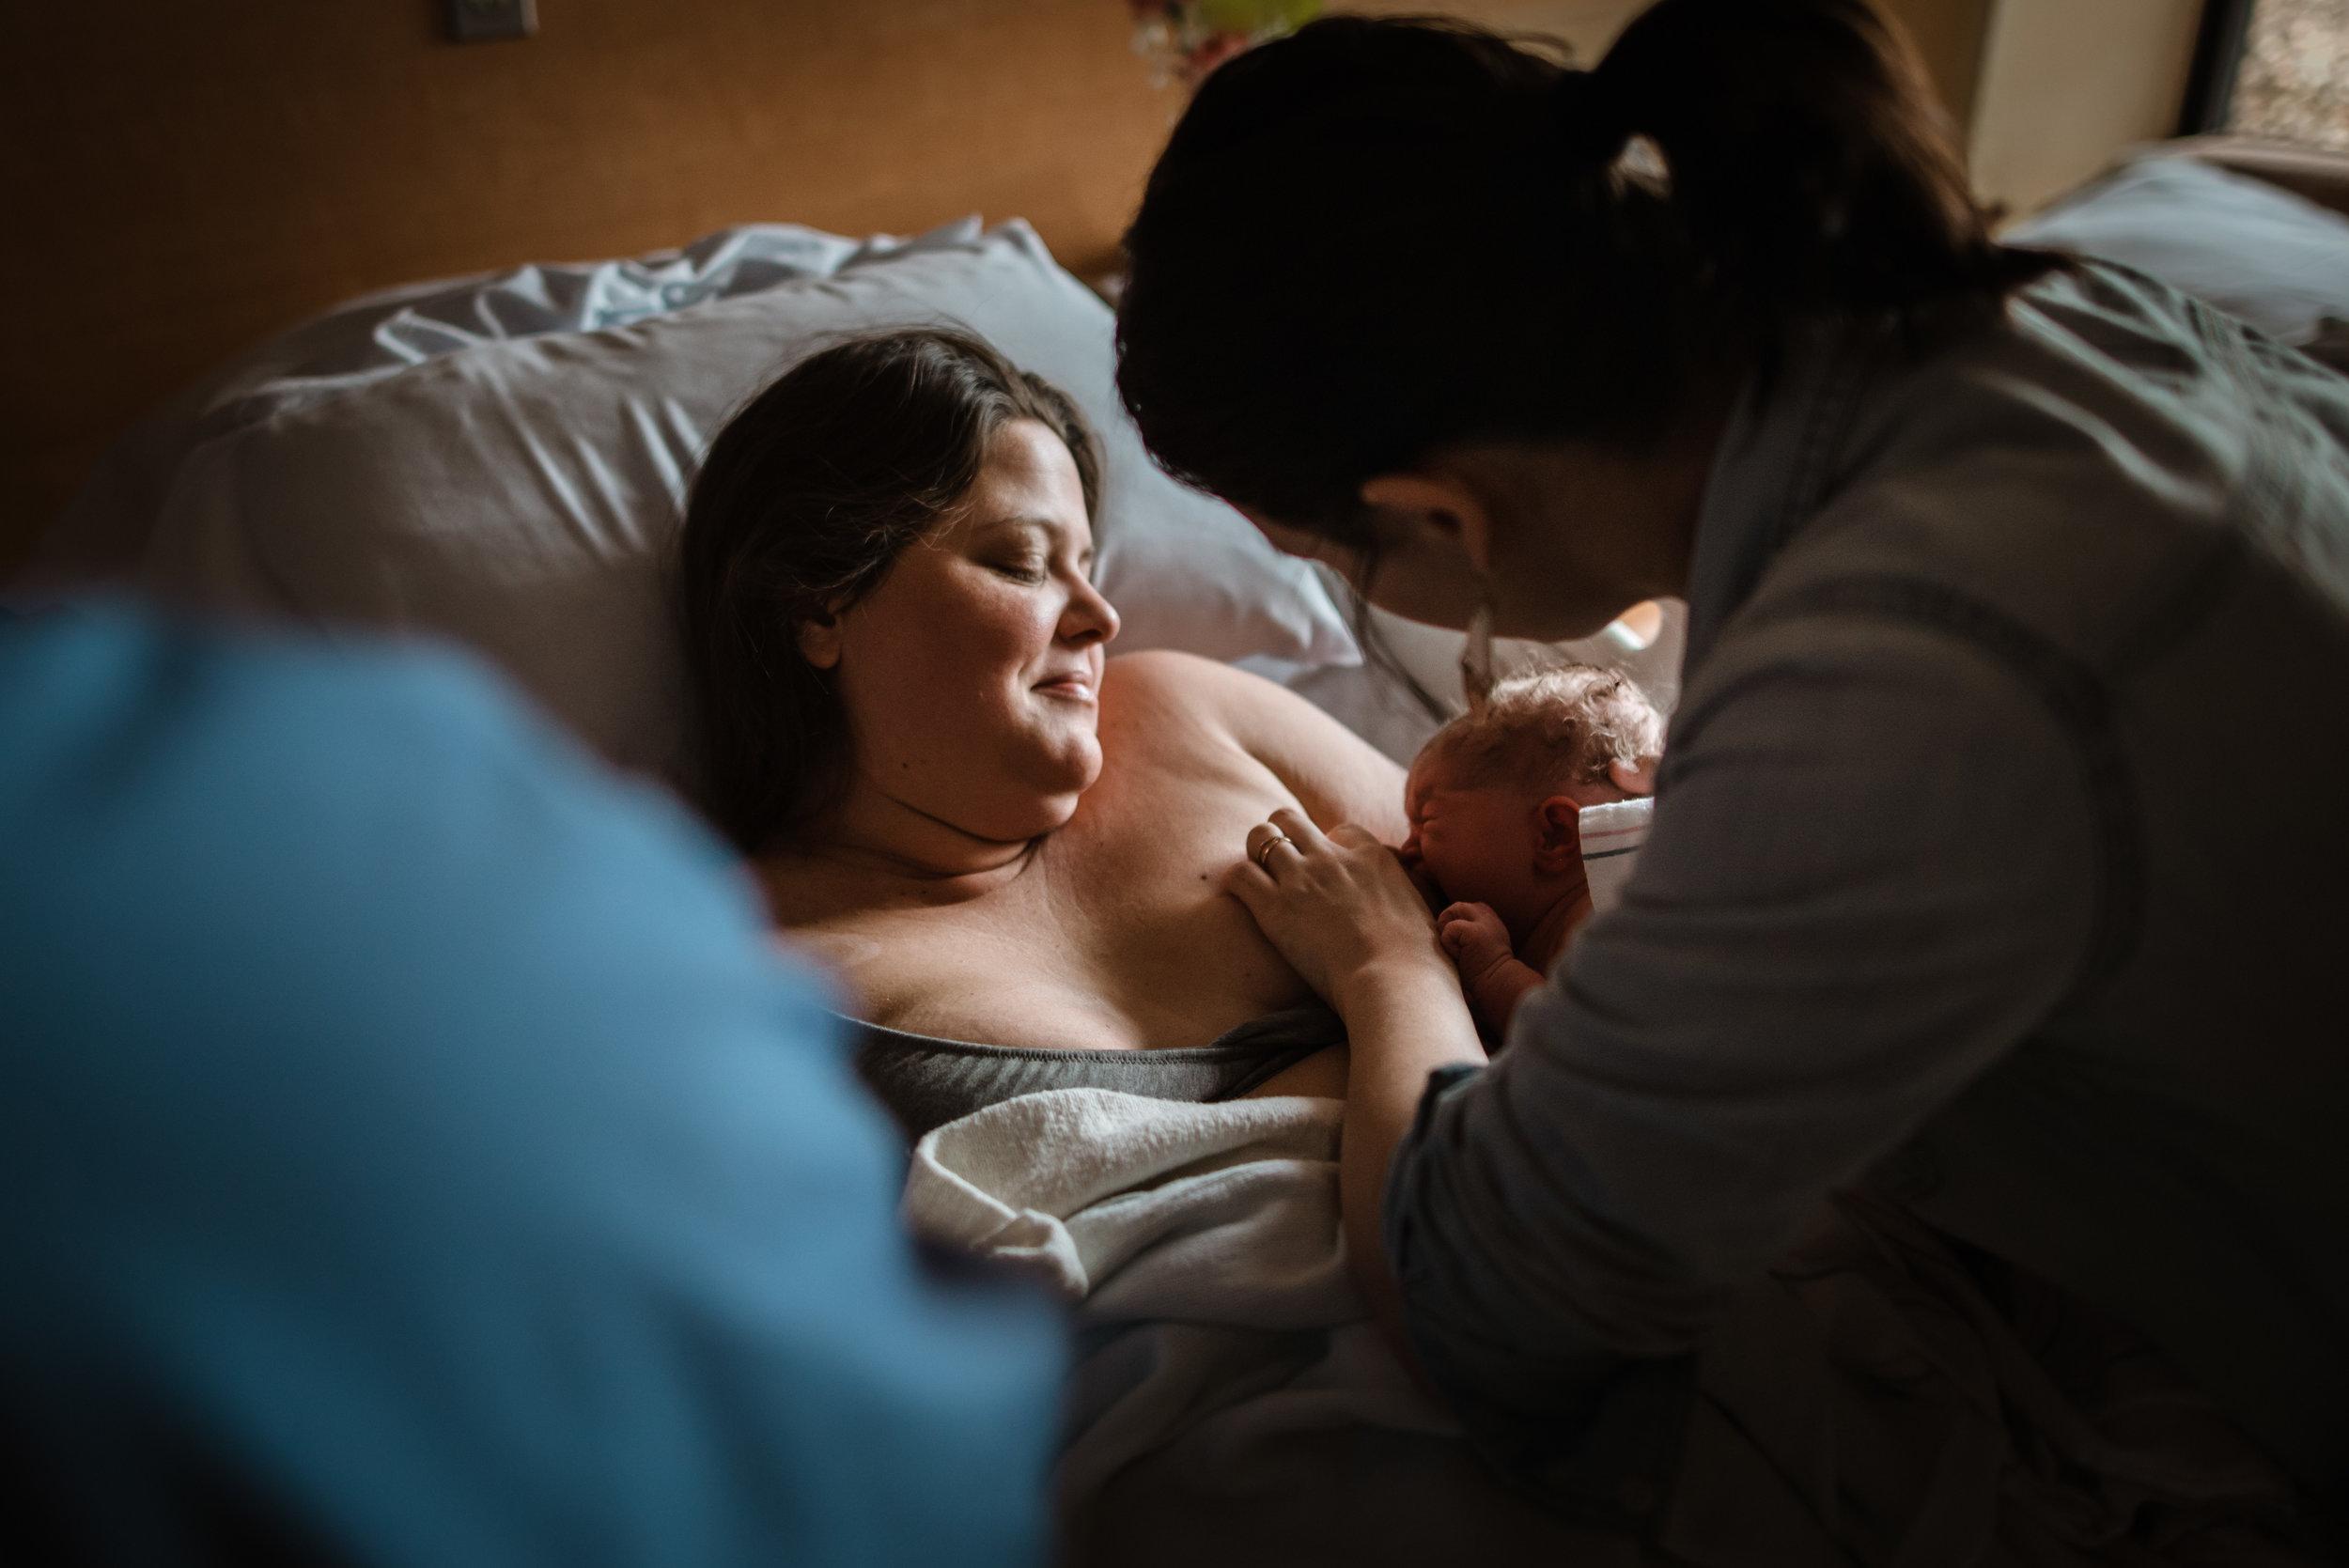 Meredith Westin Photography- Minnesota Birth Stories-January 03, 2019-150035-2.jpg